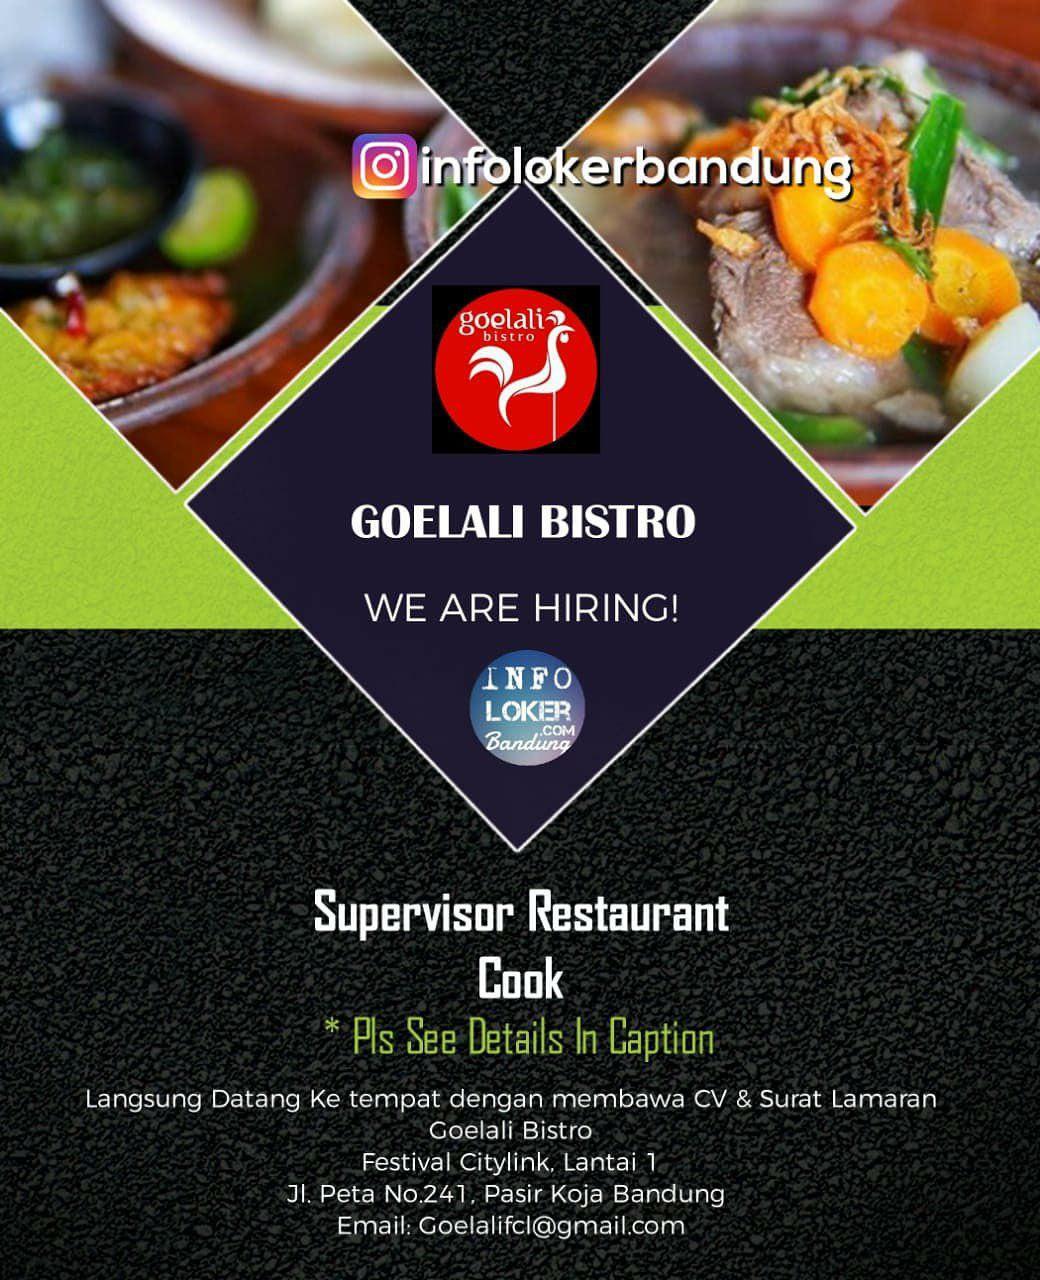 Lowongan Kerja Goelali Bistro Bandung Agustus 2018